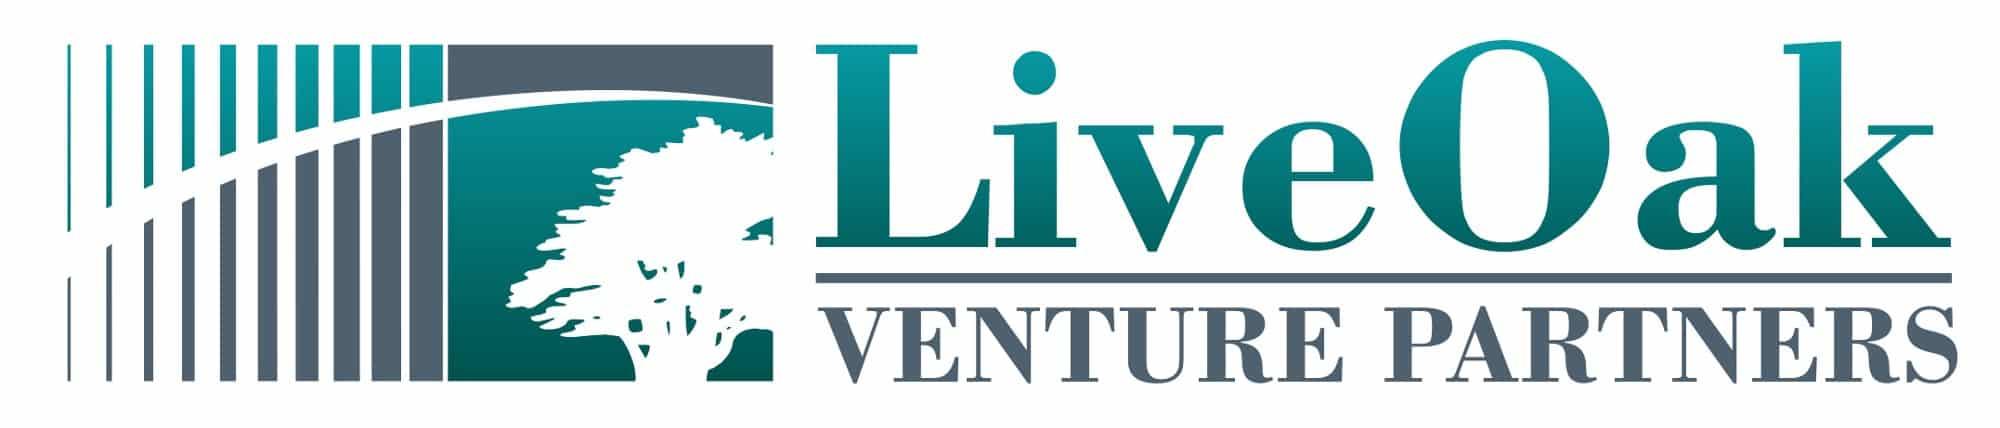 LiveOak Venture Partners   Major VC Firm Austin, Texas